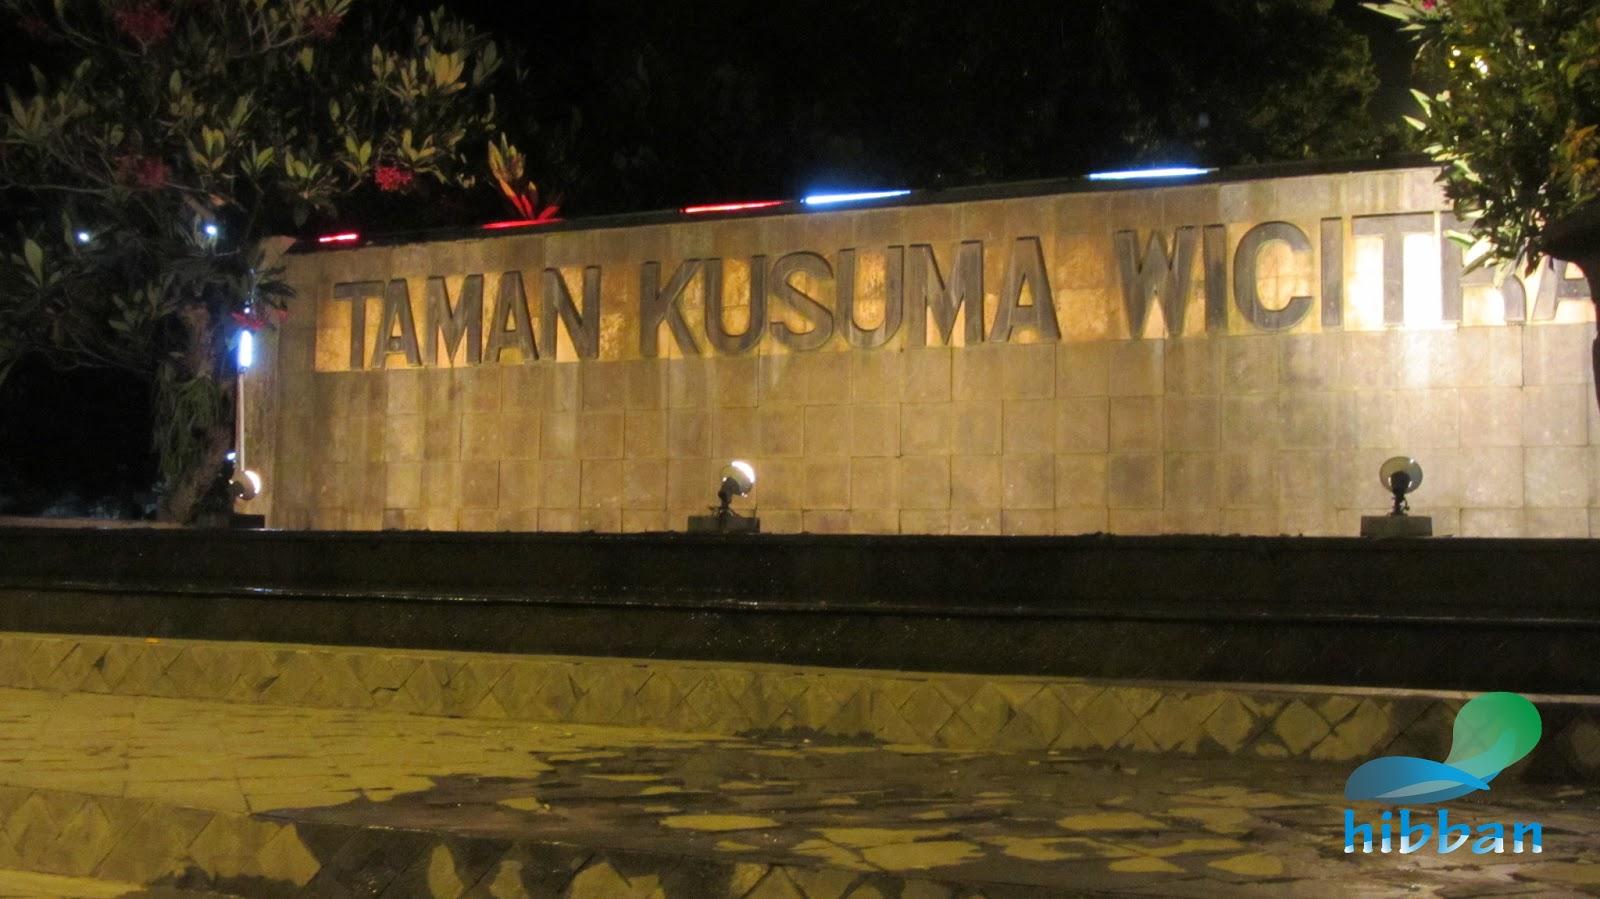 Tulungagung Indonesia  city images : ... Yahudi Simbol/Lambang Freemason di Alun alun Tulungagung, Indonesia